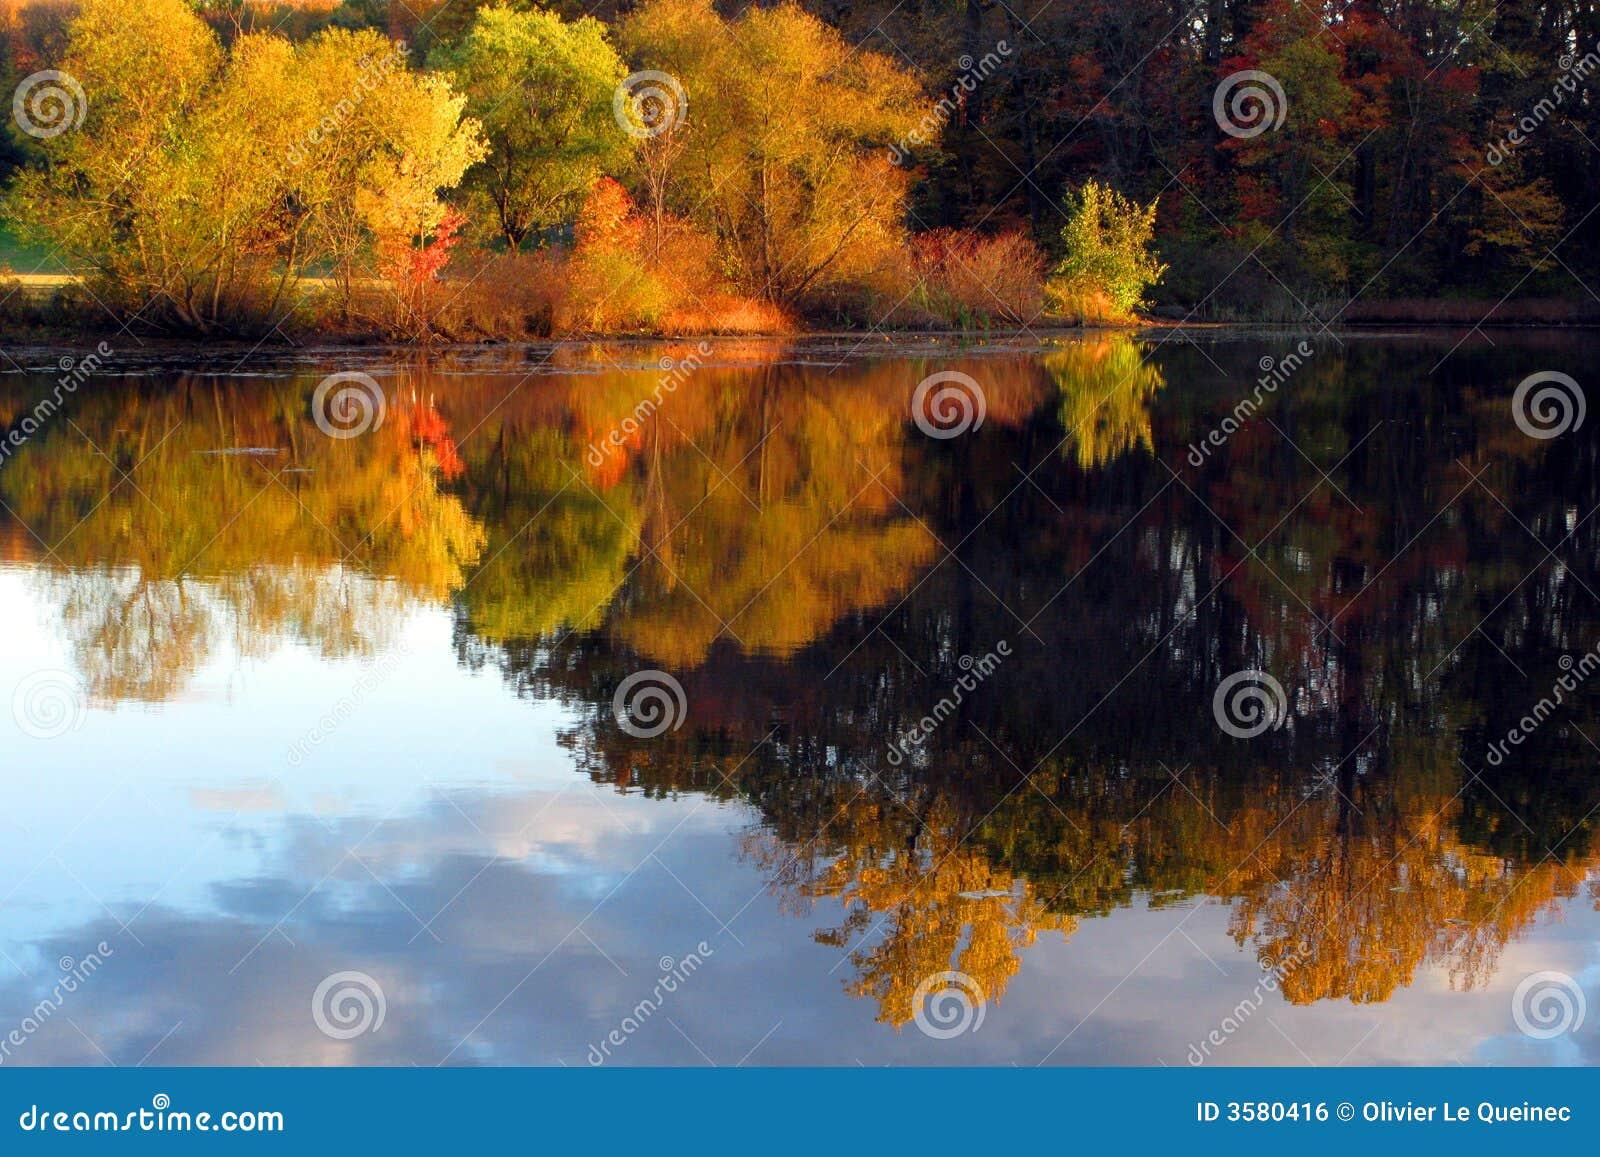 Fall lake reflection scene trees